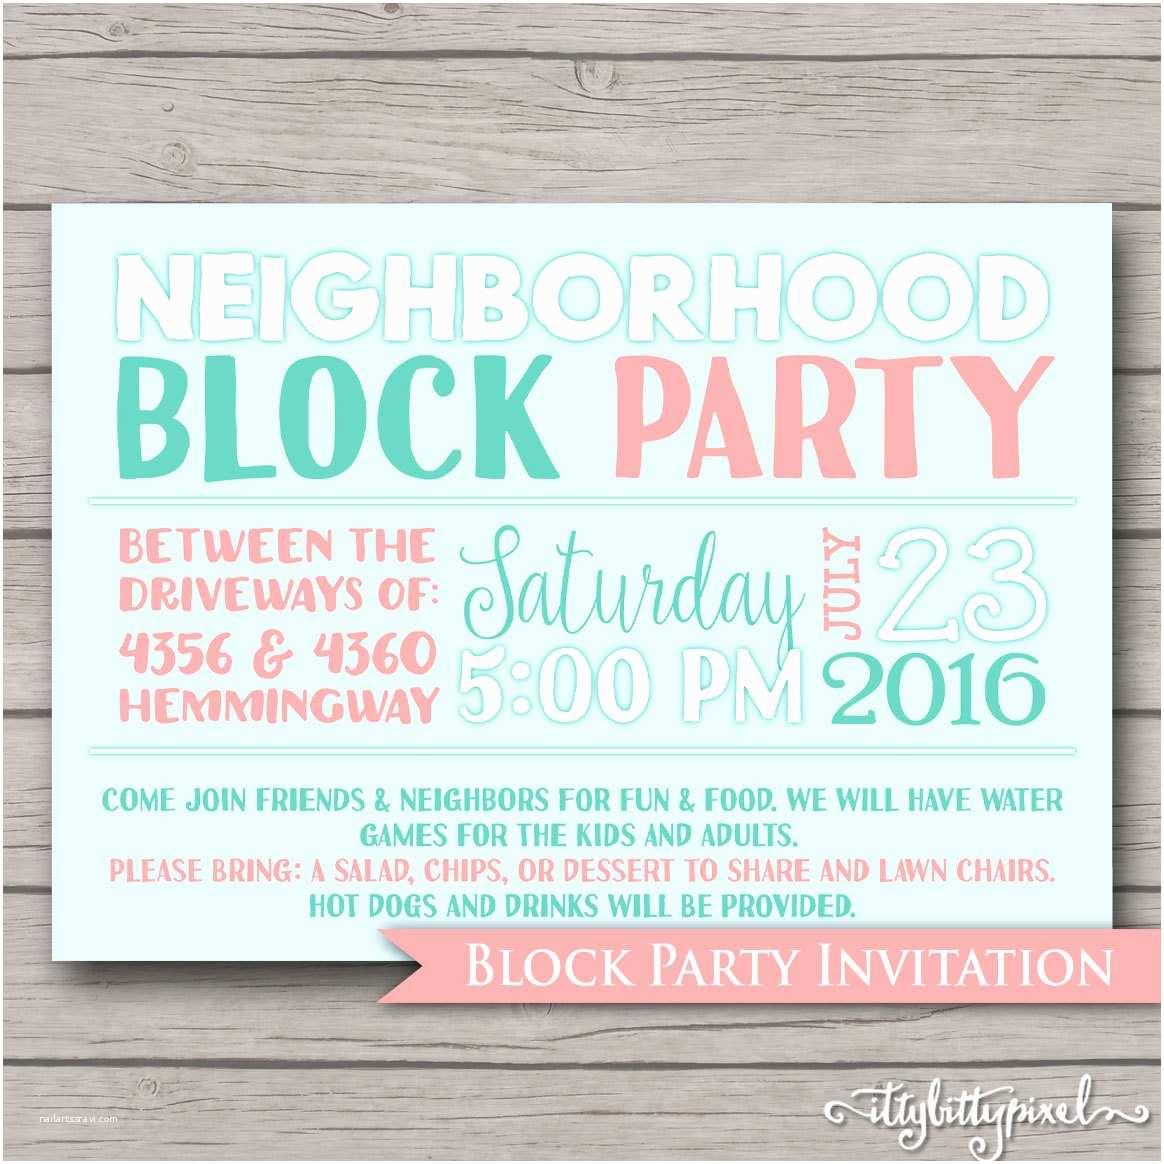 Block Party Invitation Neighborhood Block Party Invitation Announcement Invite Card